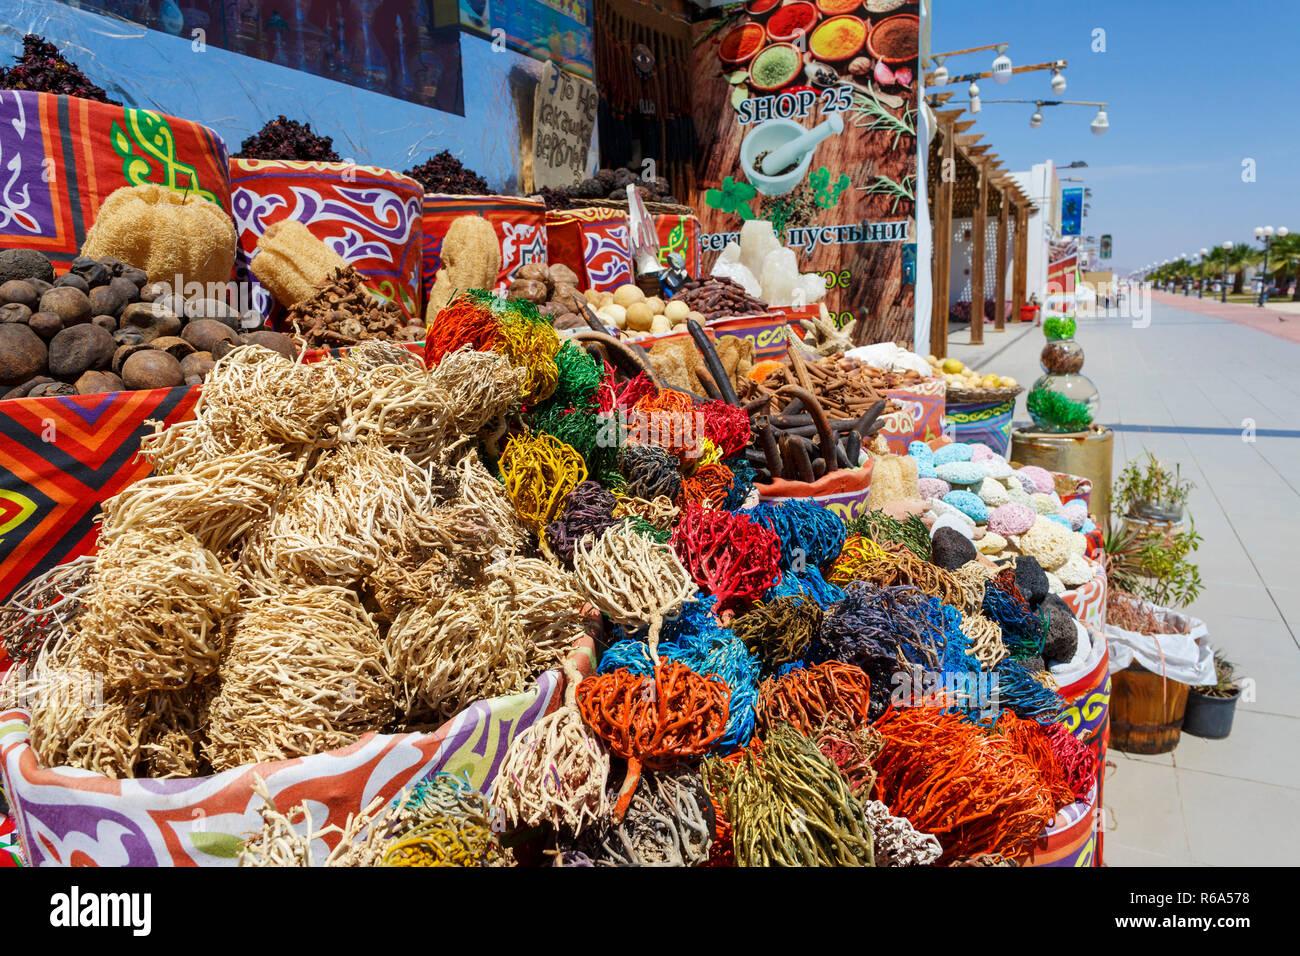 The Old Town in Red Sea coastal resort Sharm el-Sheikh, south Sinai, Egypt, April 11, 2018. (CTK Photo/Michal Okla) - Stock Image